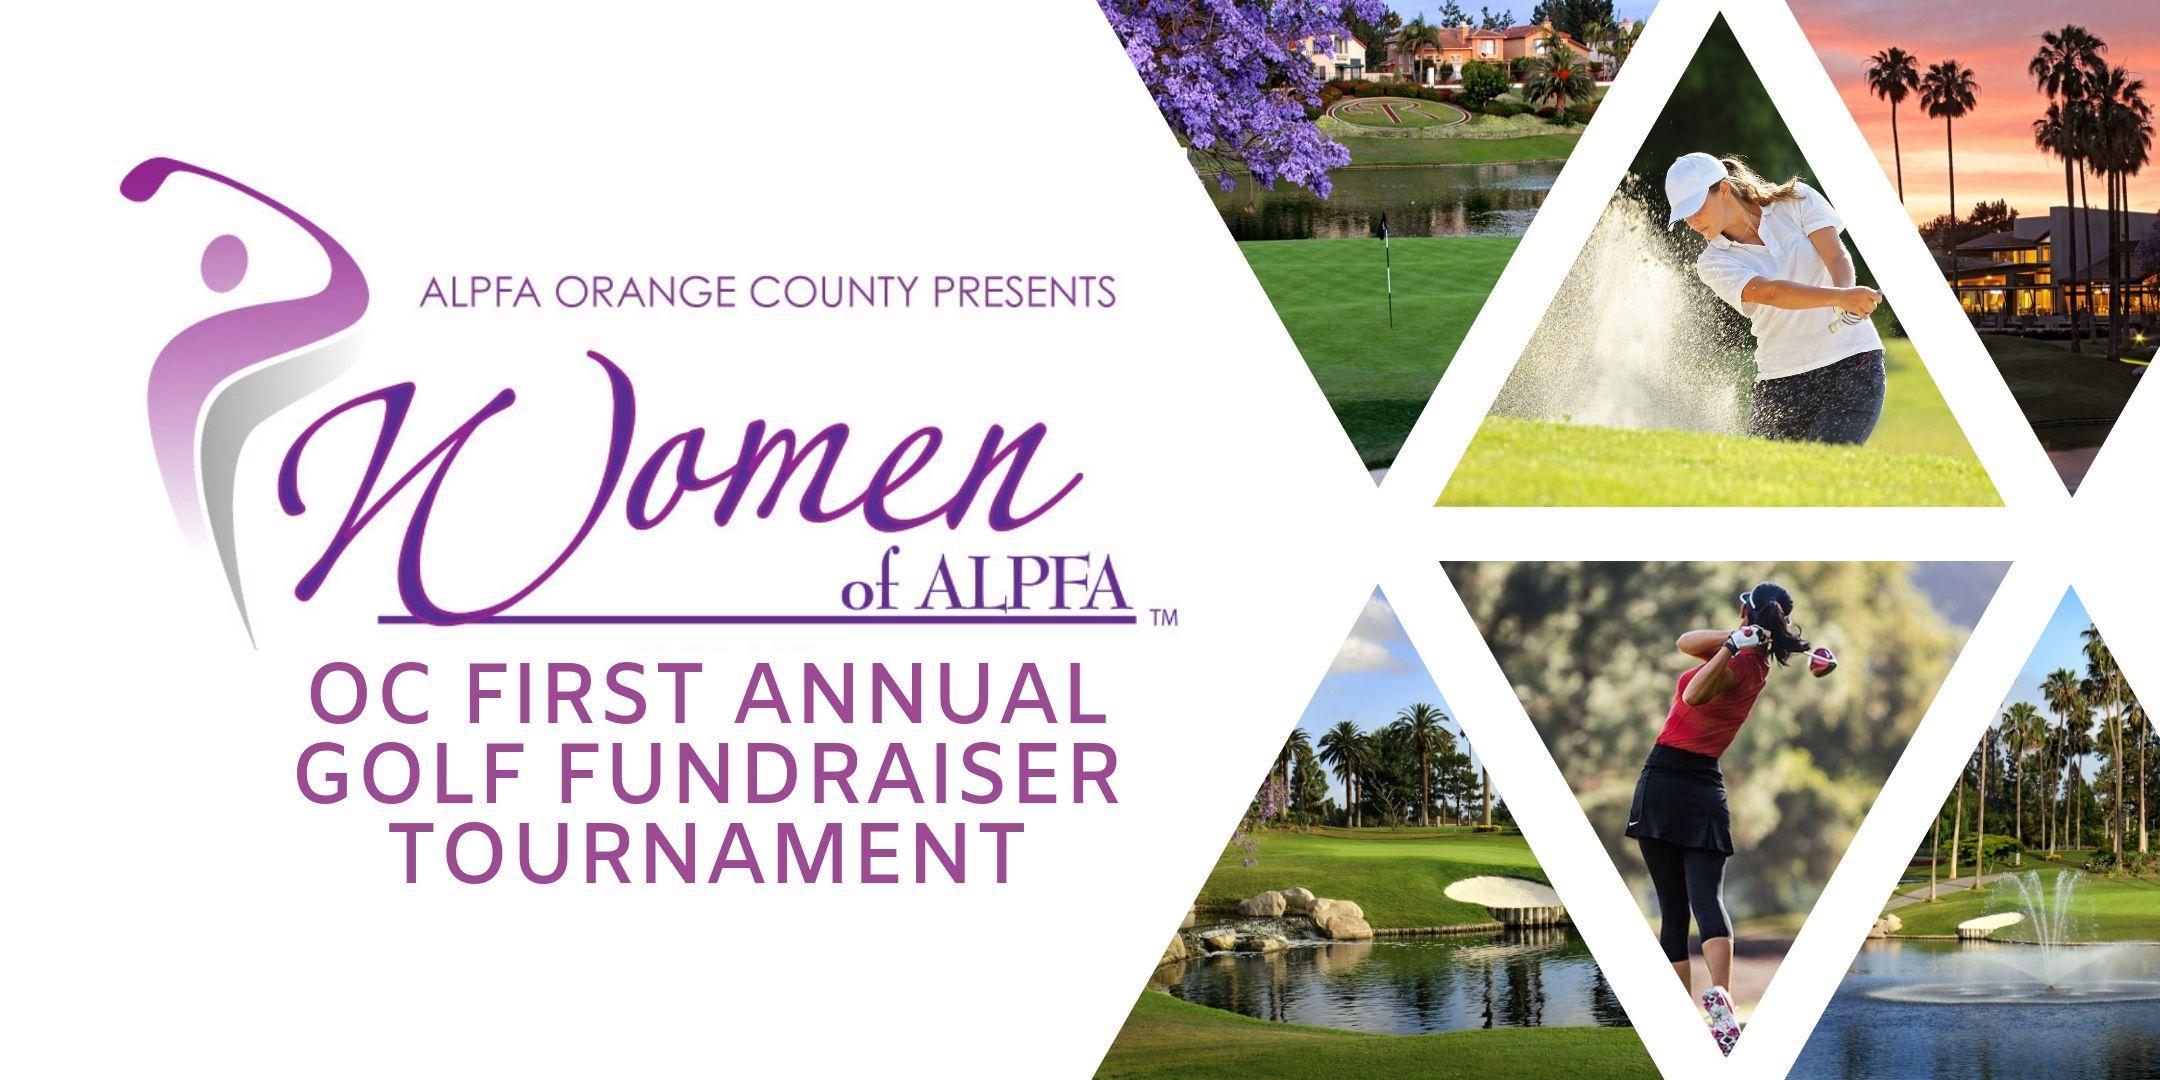 ALPFA OC First Annual Golf Tournament - WOA Fundraiser